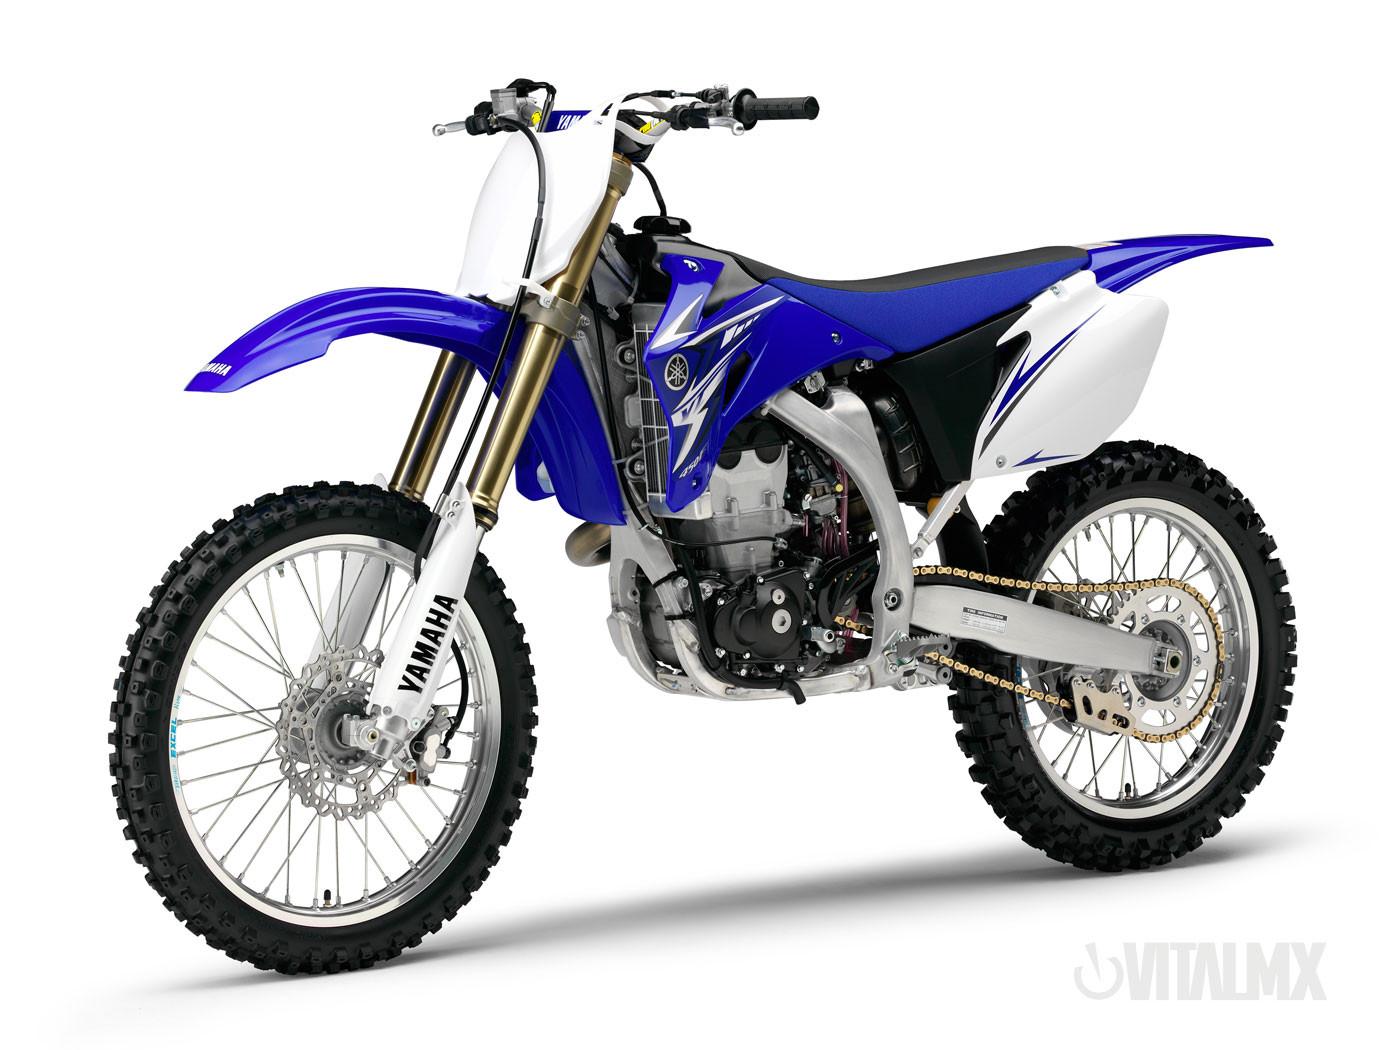 2009 Yamaha YZ450F - 2009 Yamaha YZ450F - Motocross Pictures - Vital MX